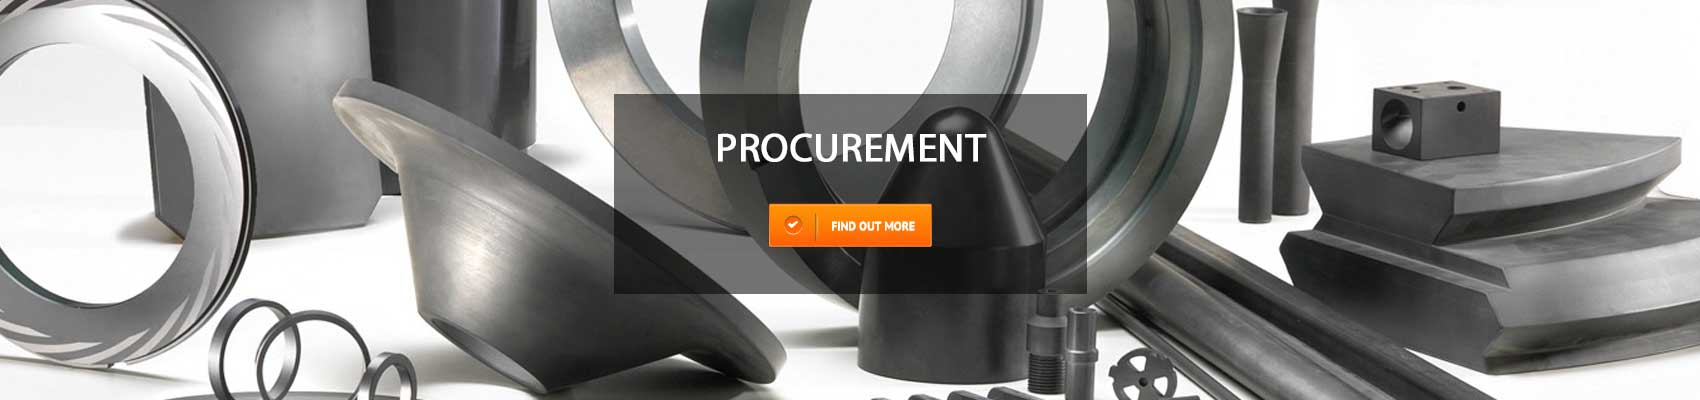 slides-procurement